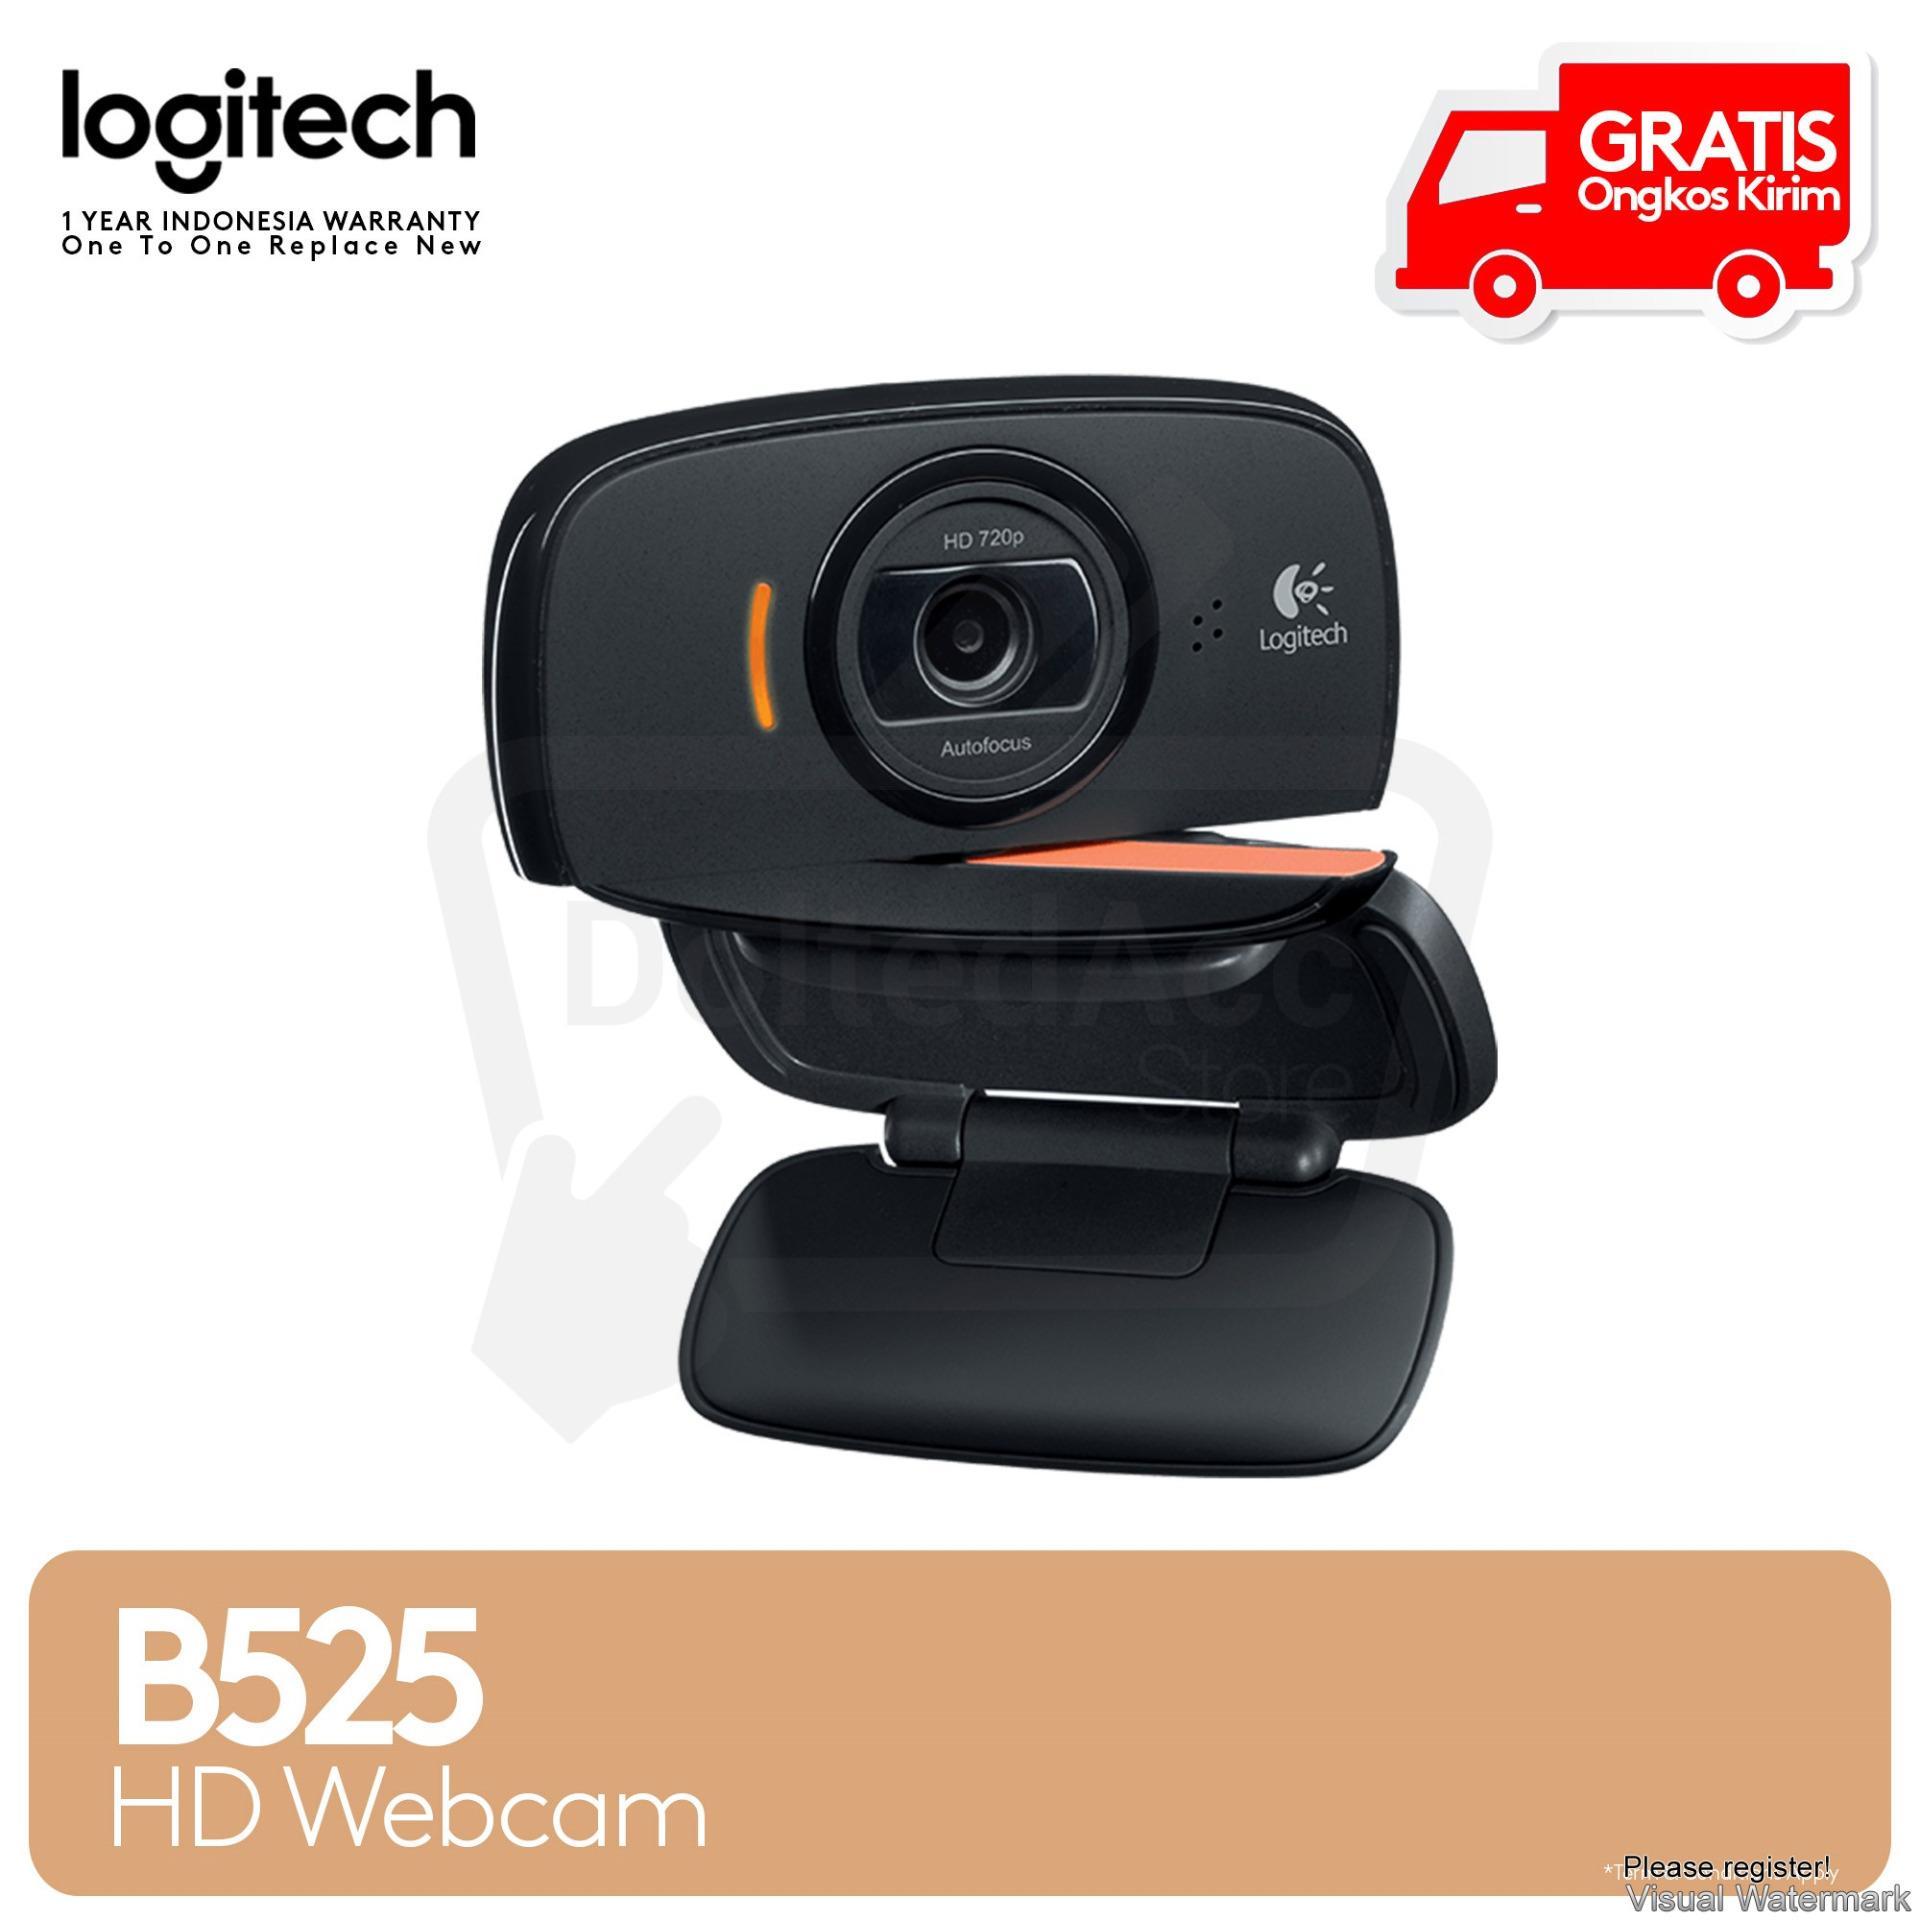 Fitur Logiitech B525 Hd Hitam Dan Harga Terbaru Info Philips Setrika 1172 3